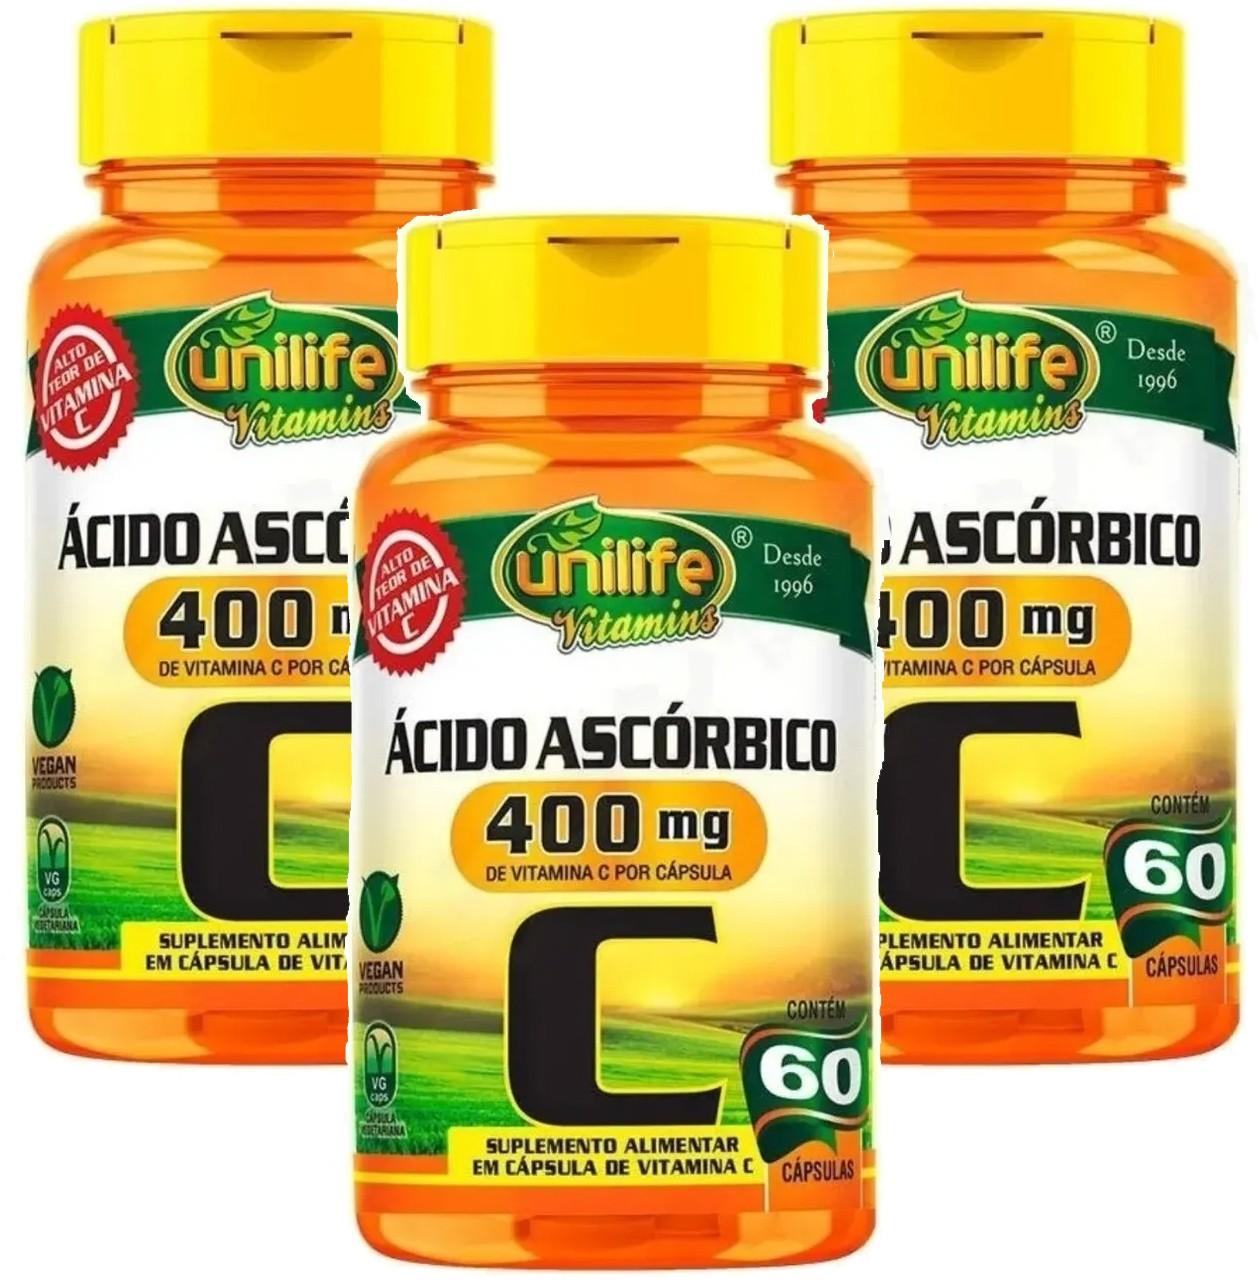 Kit C/ 3 Un. Vitamina C Pura Ácido Ascórbico 750mg 180 Caps